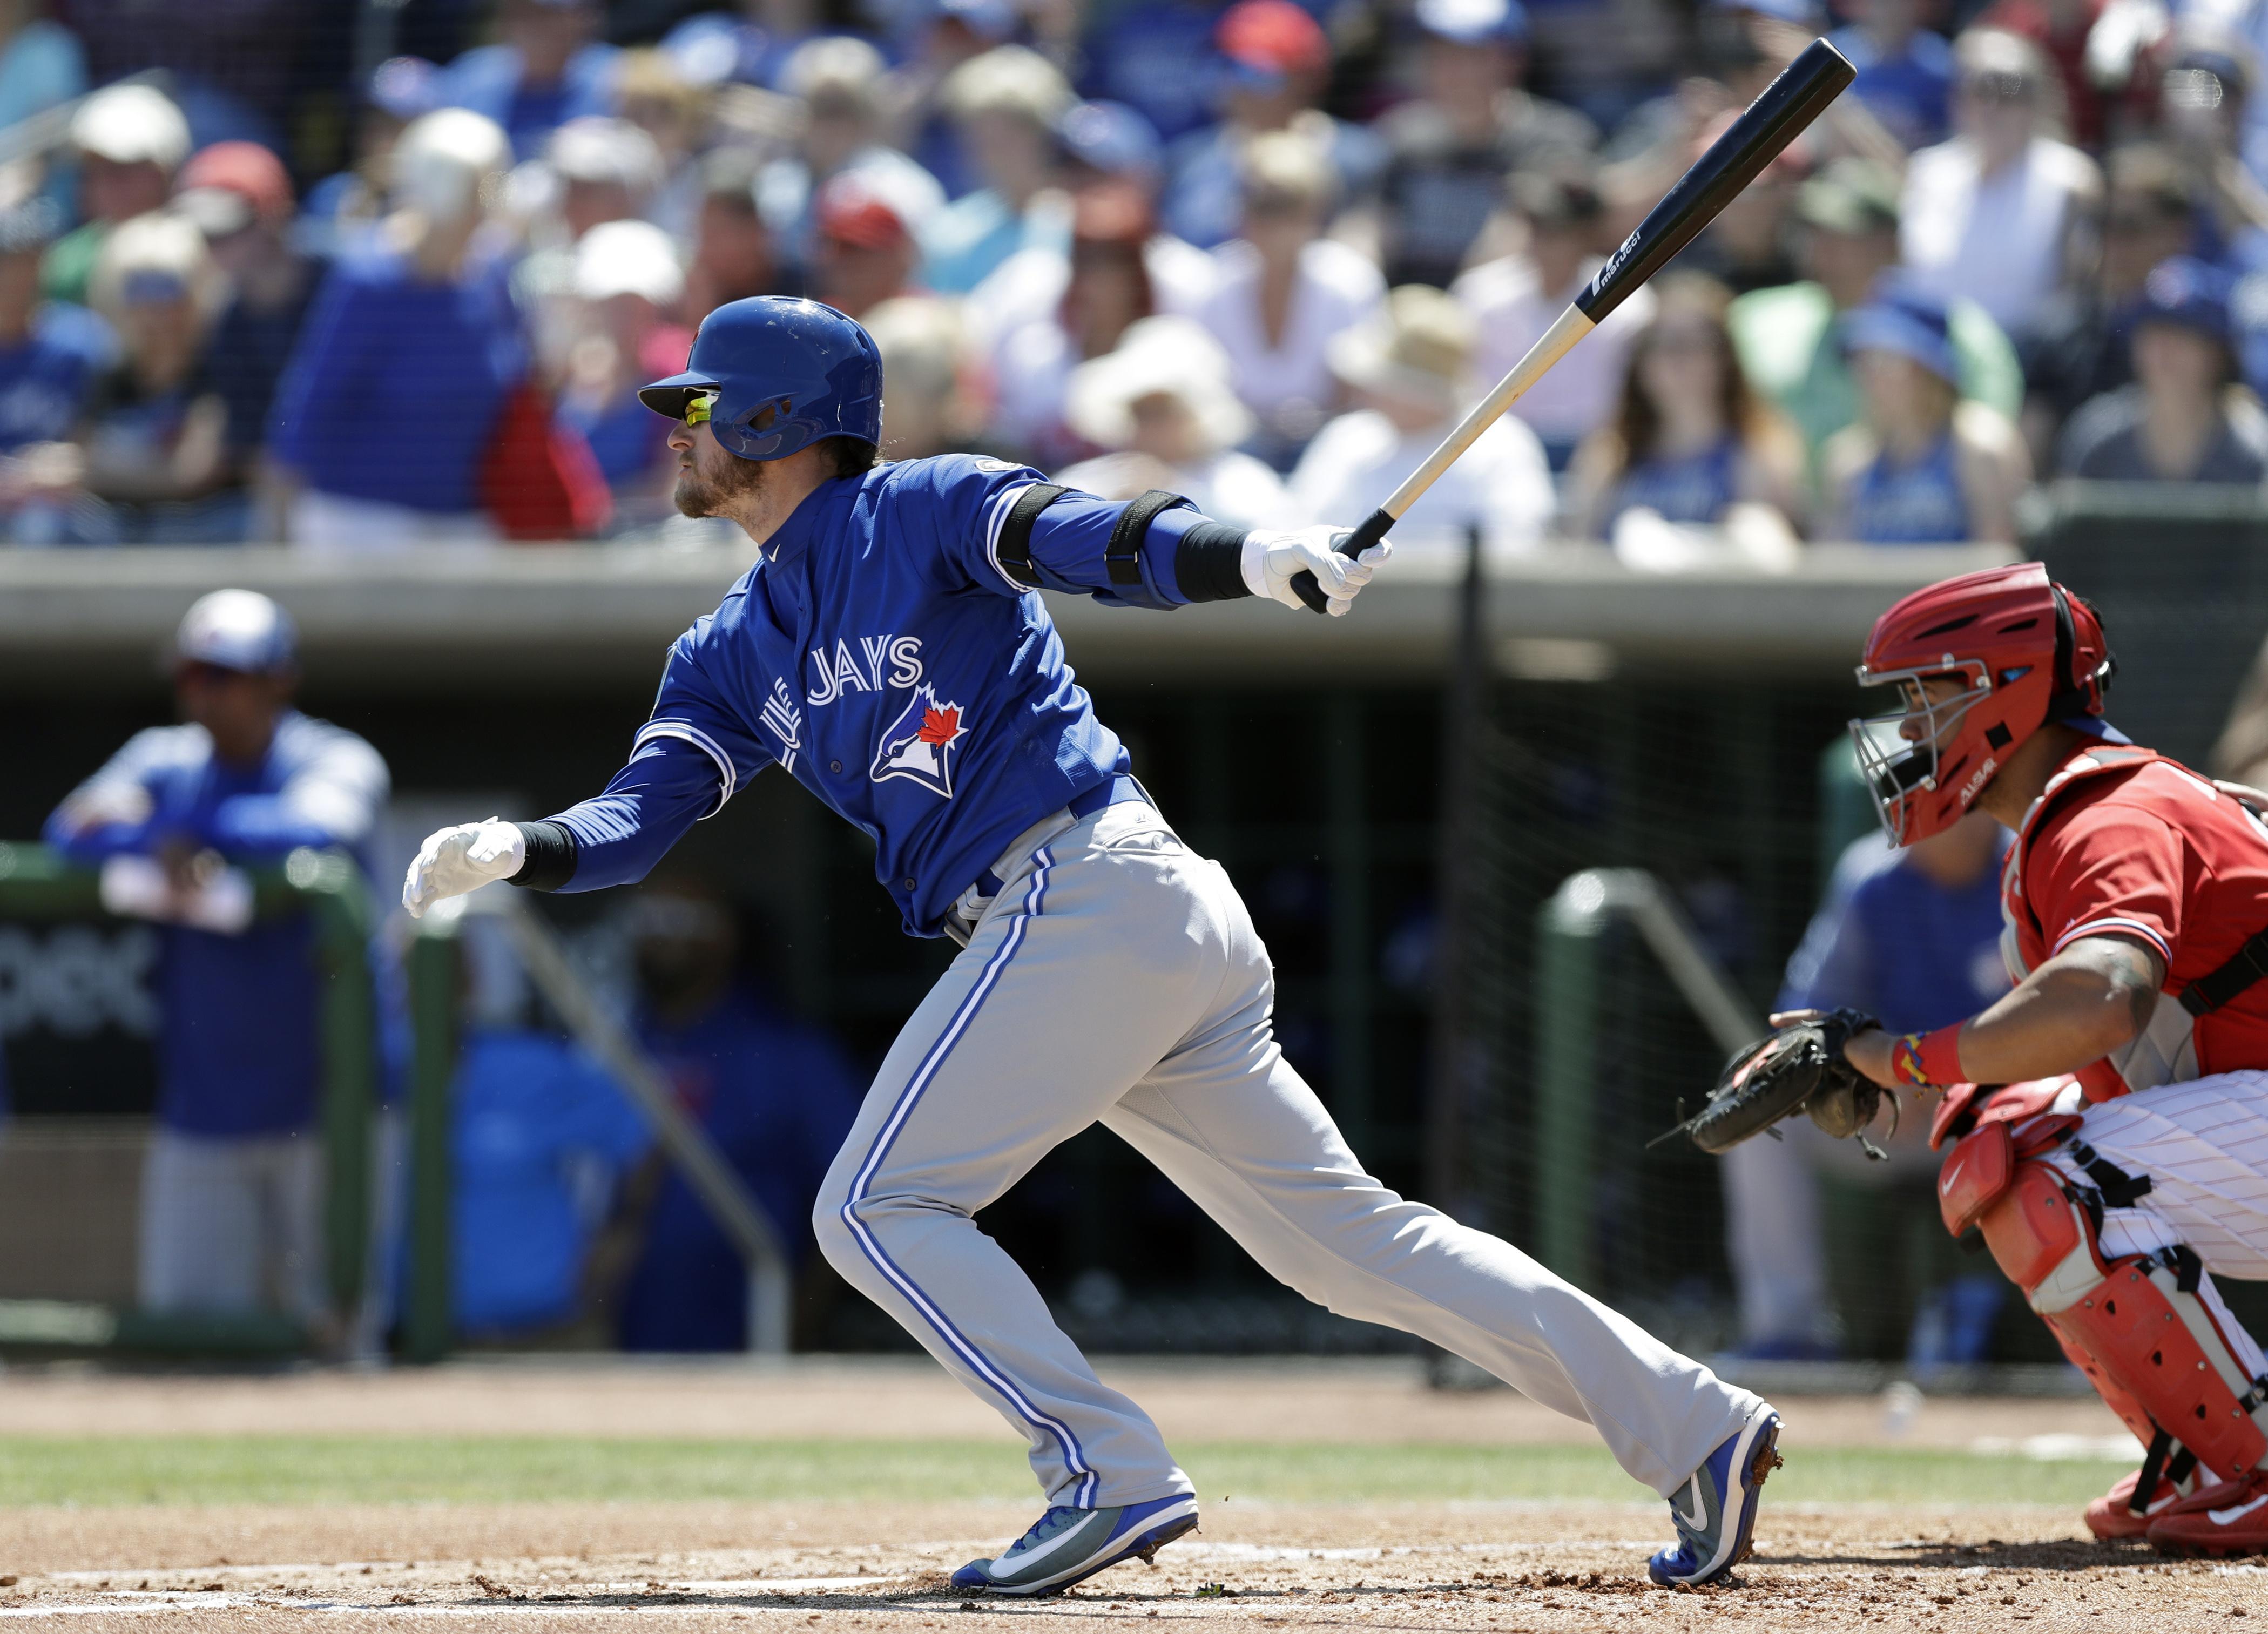 Blue_jays_preview_baseball_56698